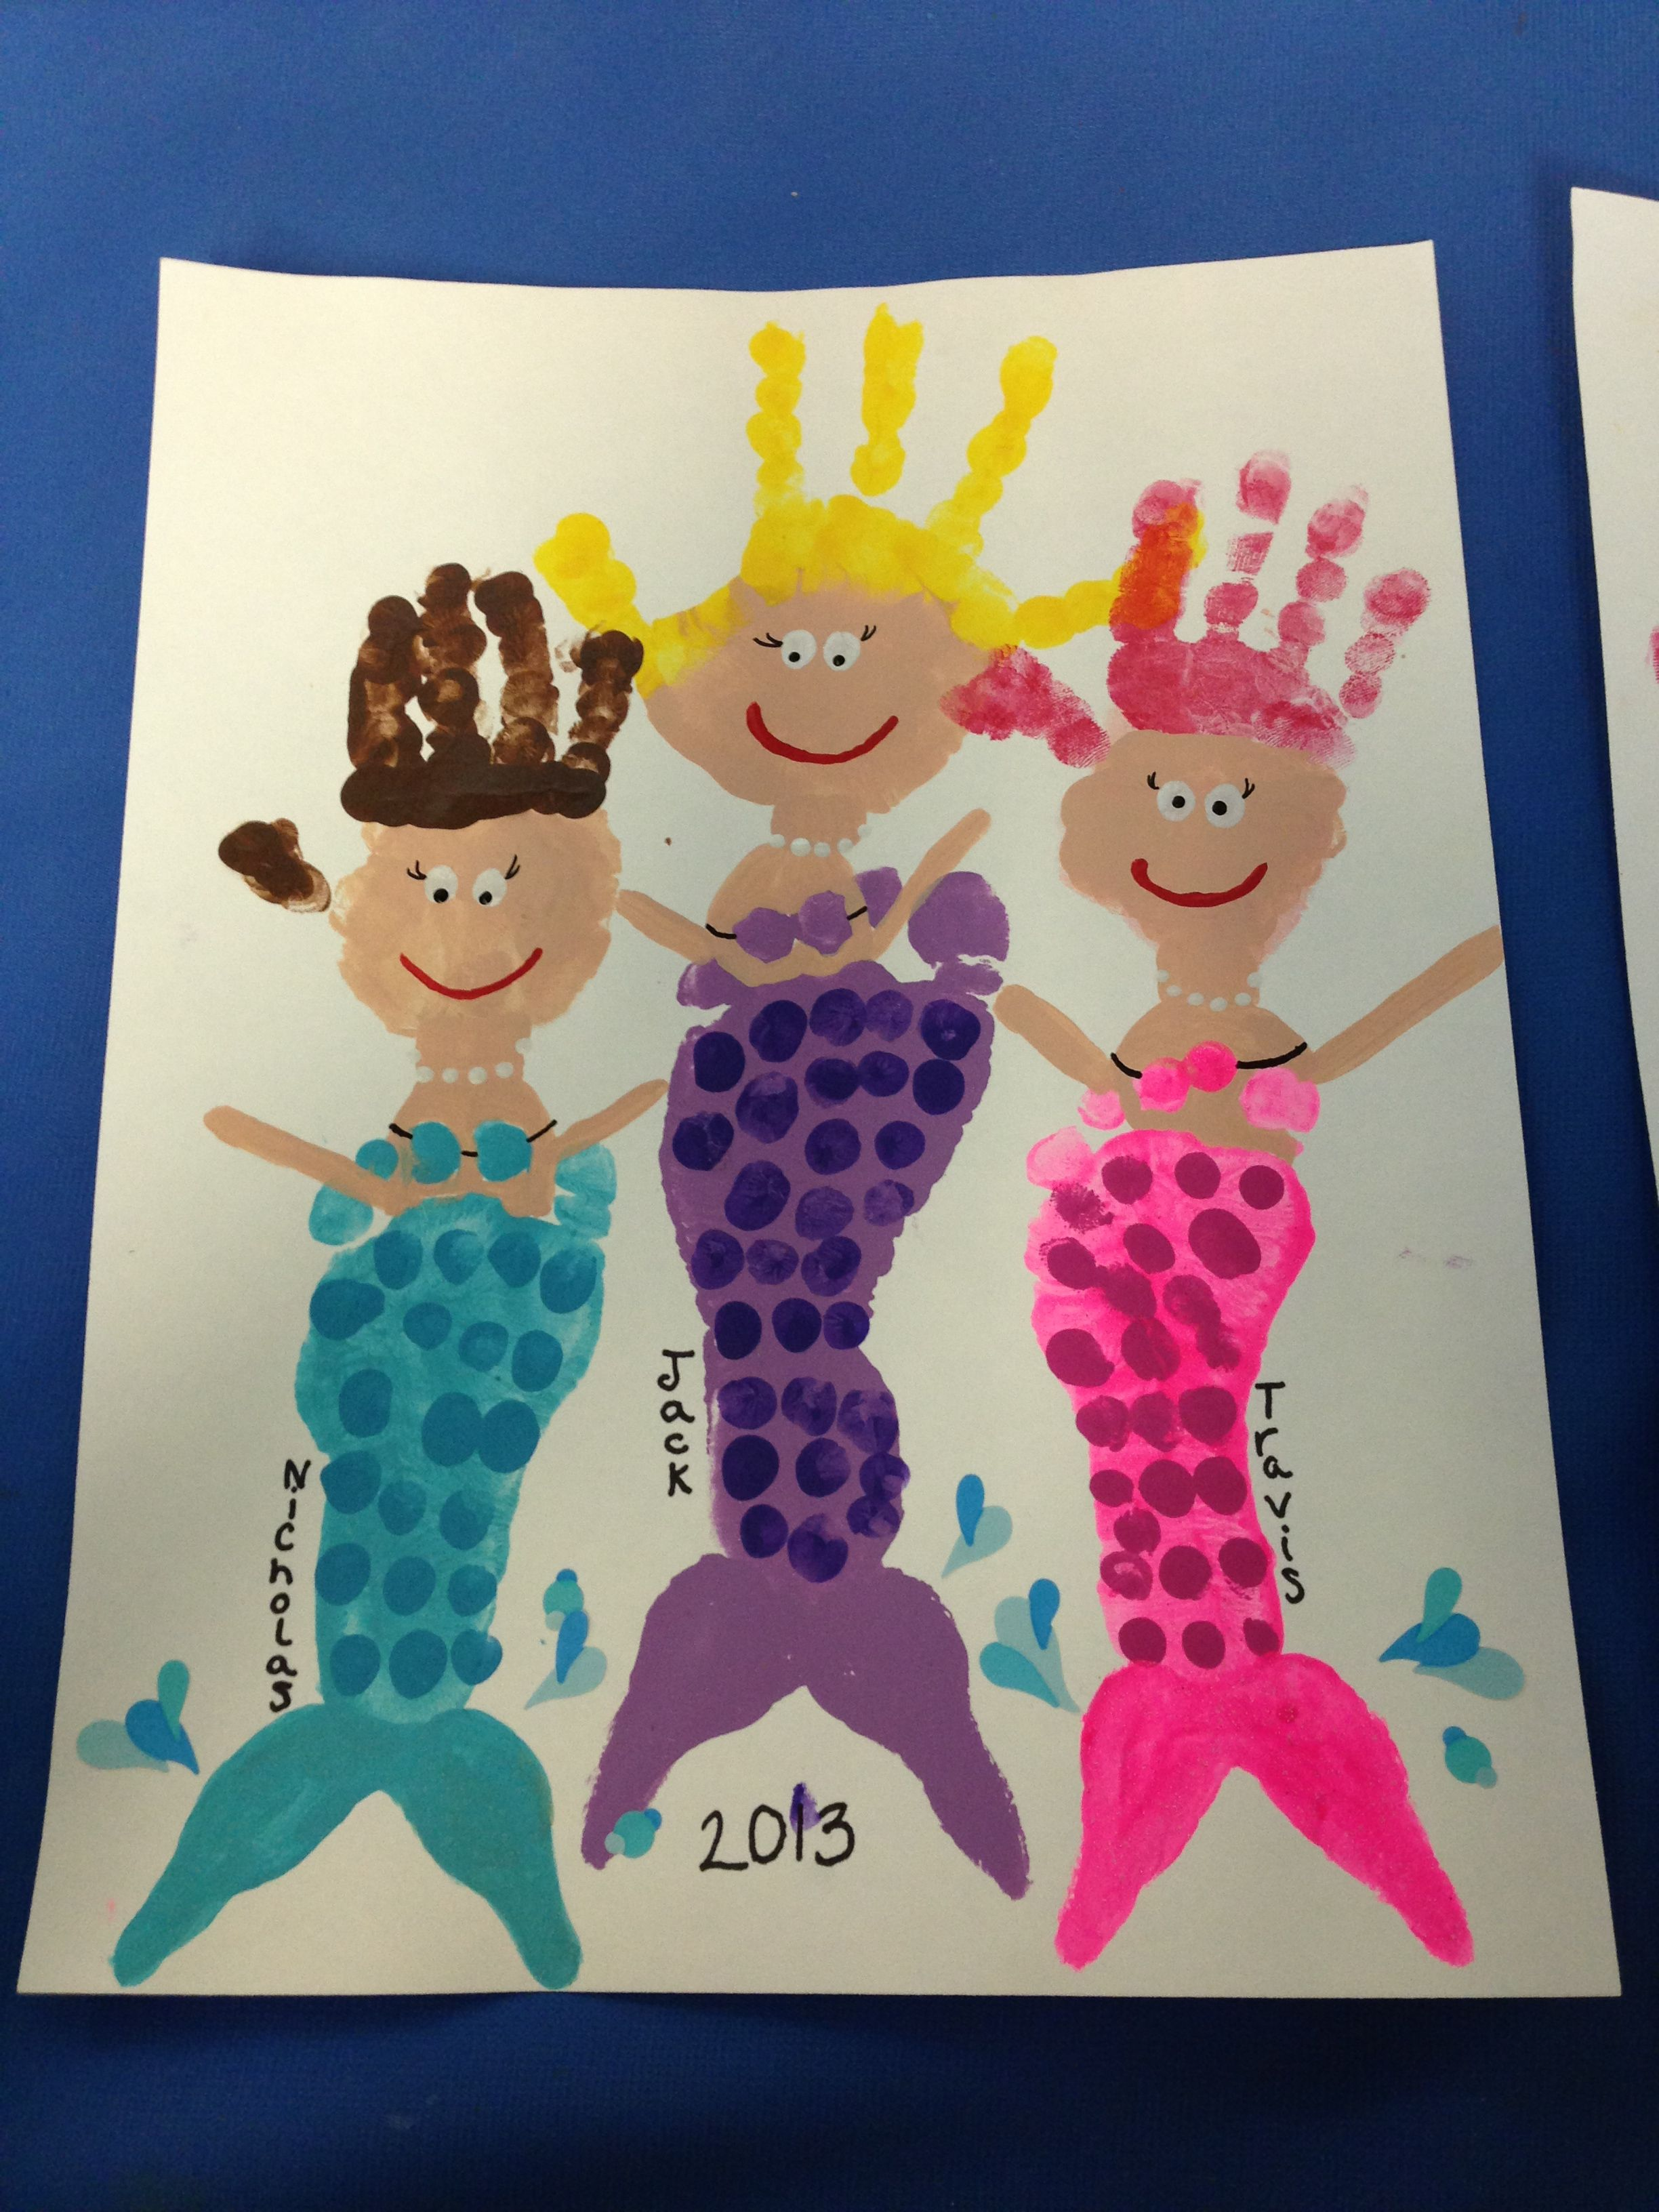 Footprint Handprint Mermaids Colormycoaster Lormycoaster